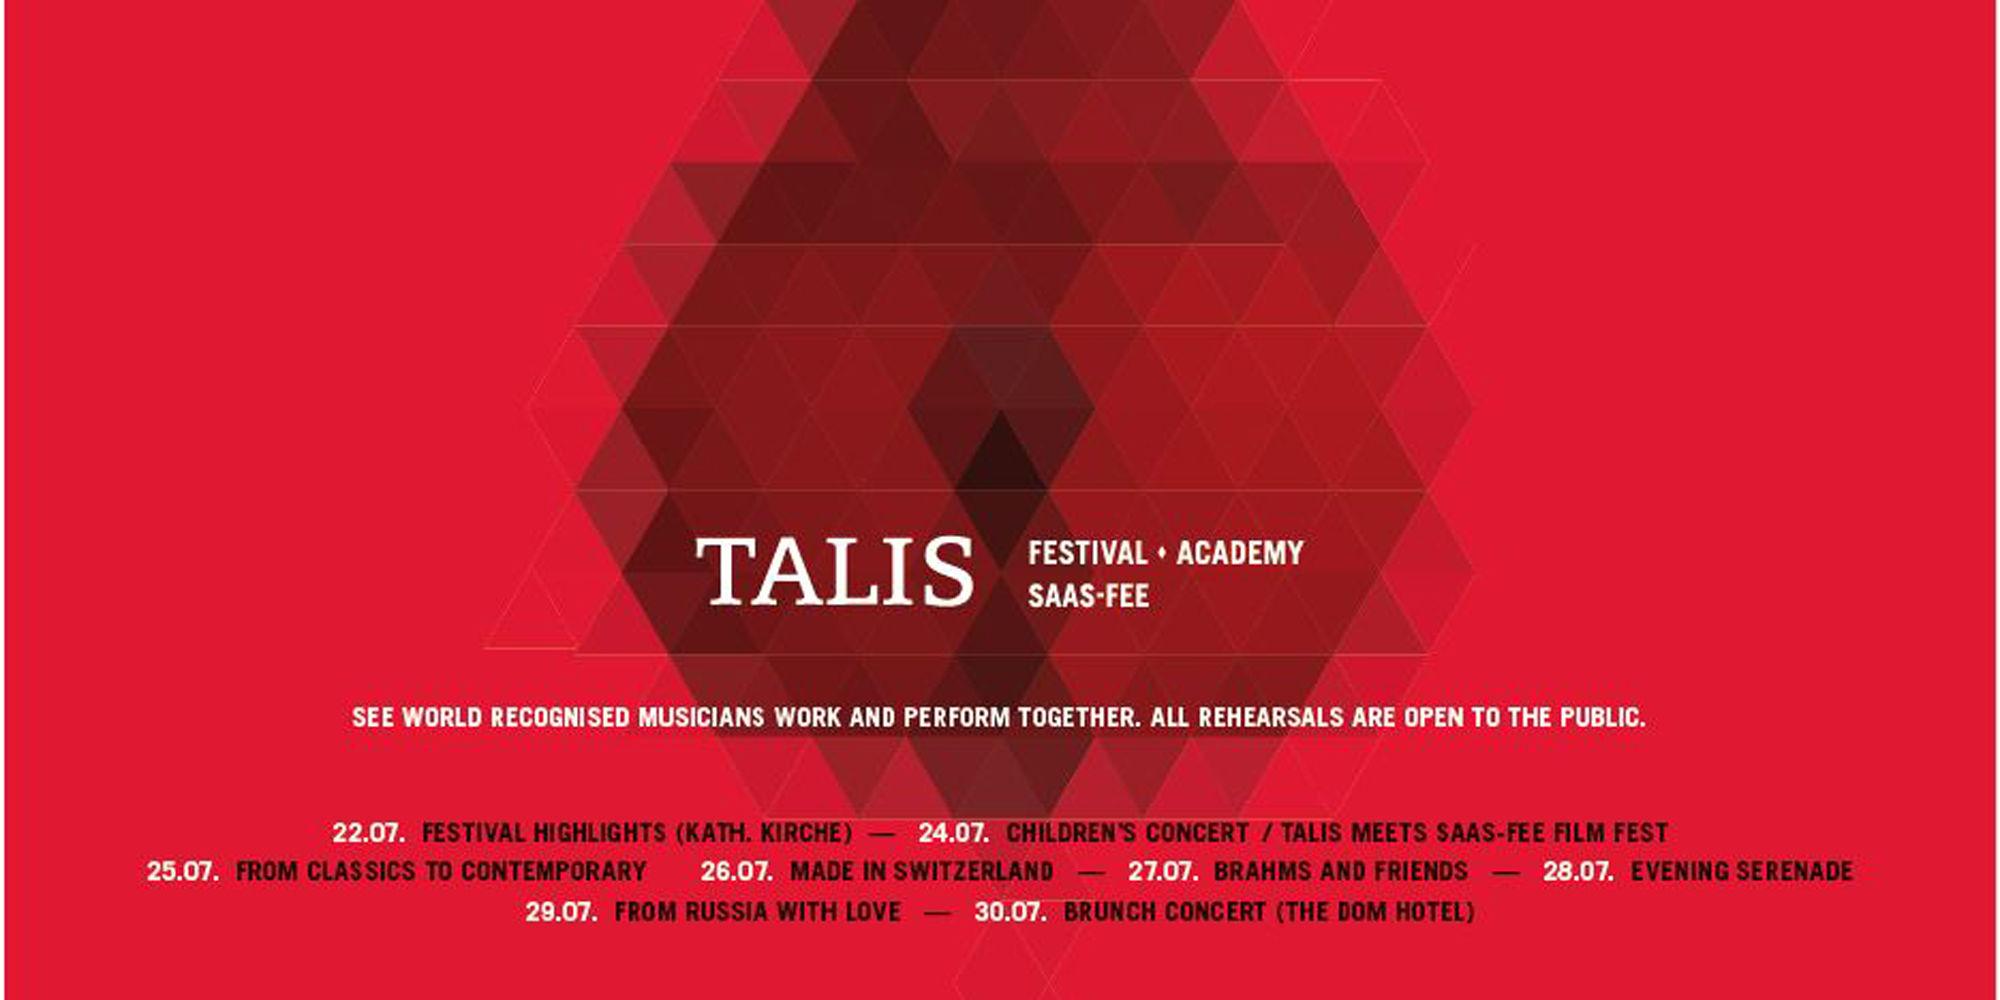 Talis Festival & Academy Saas-Fee